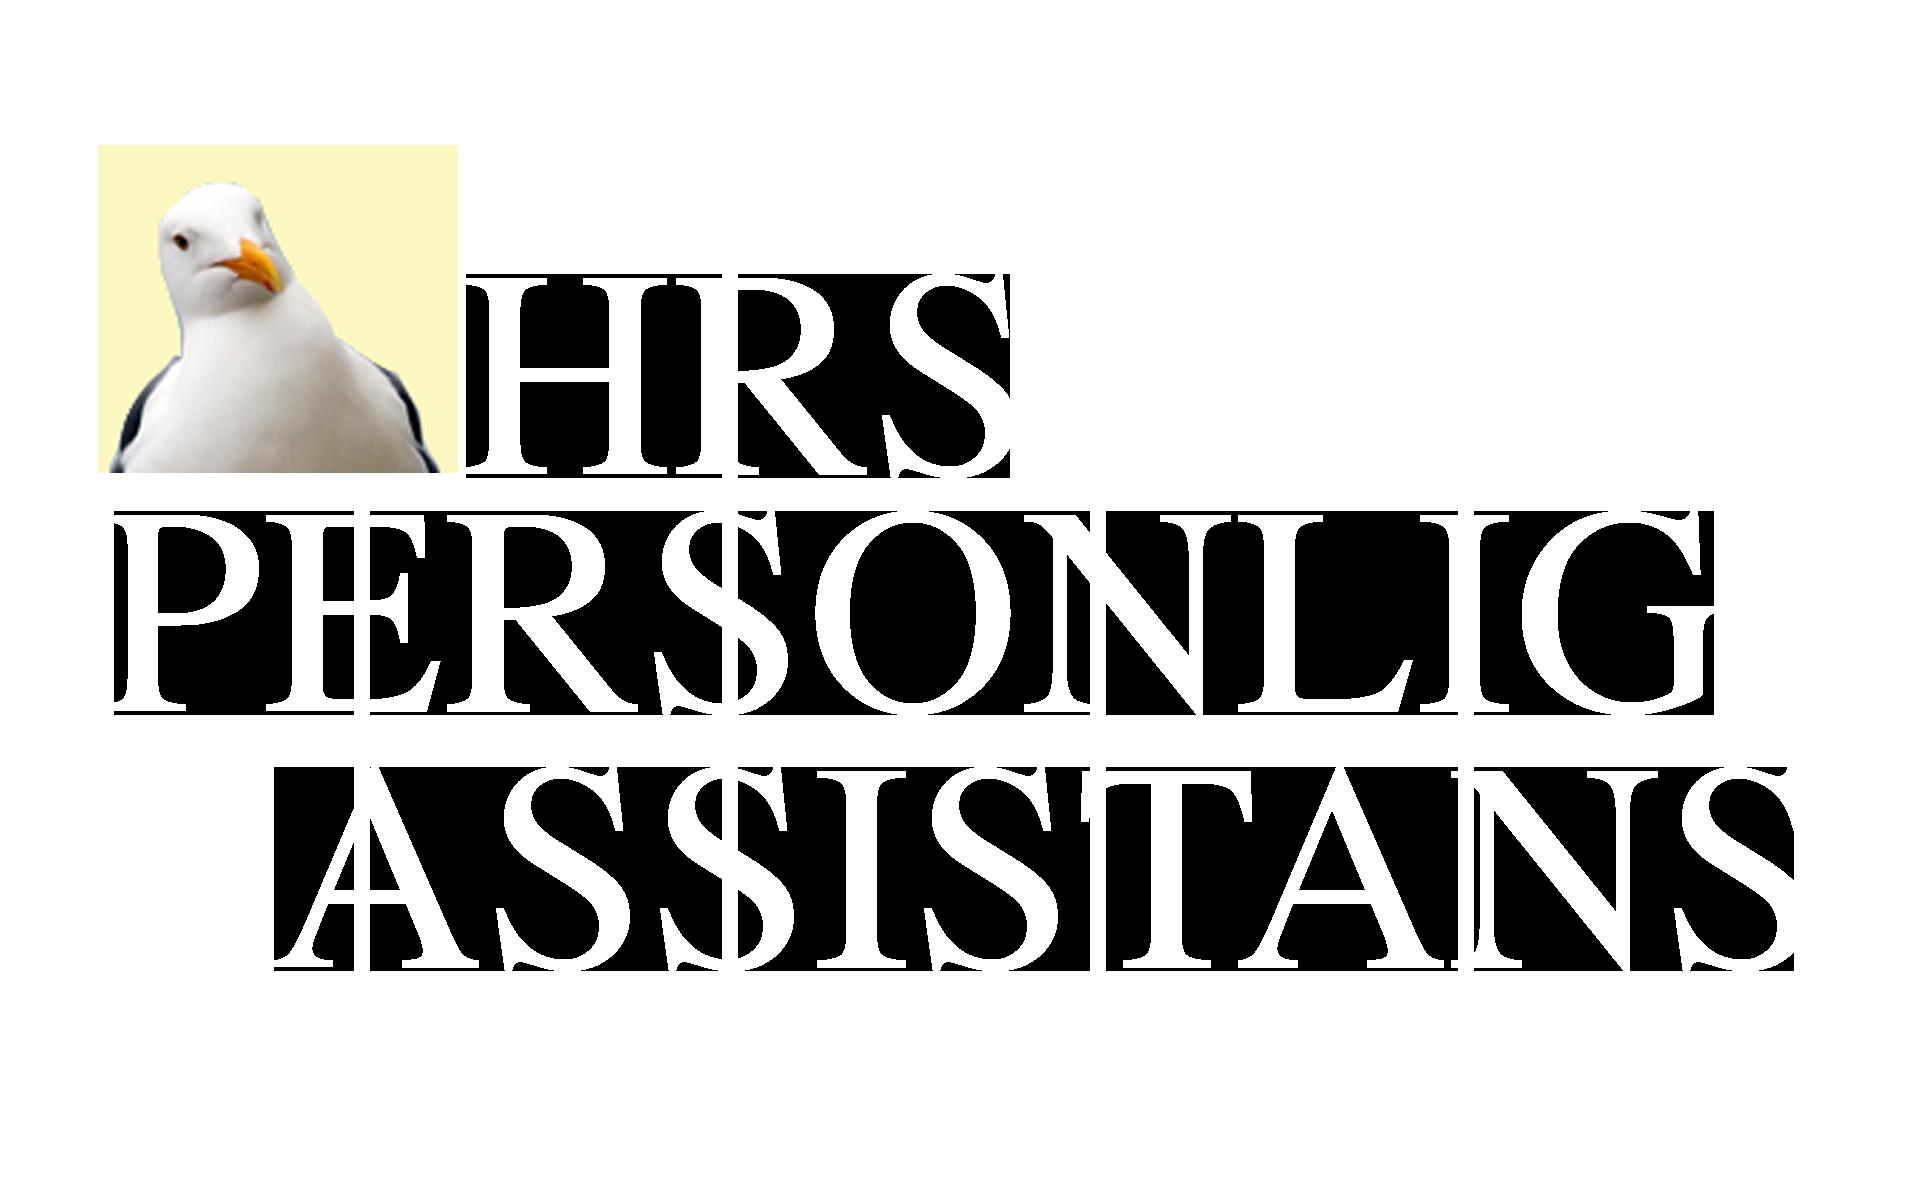 HRS Personlig Assistans